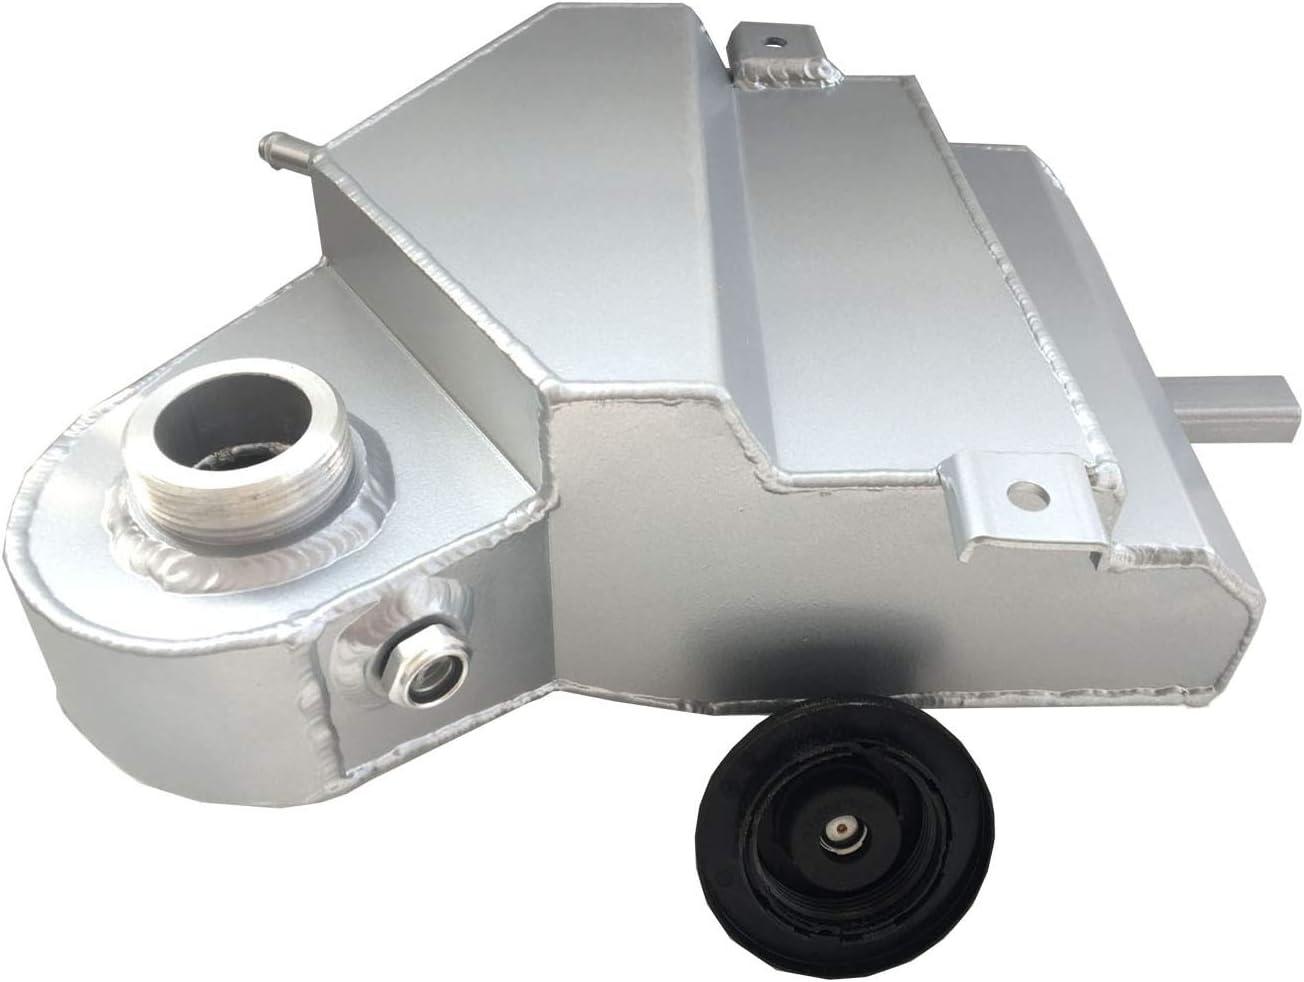 Fits 6.0L Ford F-250 F-350 Powerstroke Diesel Aluminum Coolant Overflow Bottle Reservoir Tank Silver